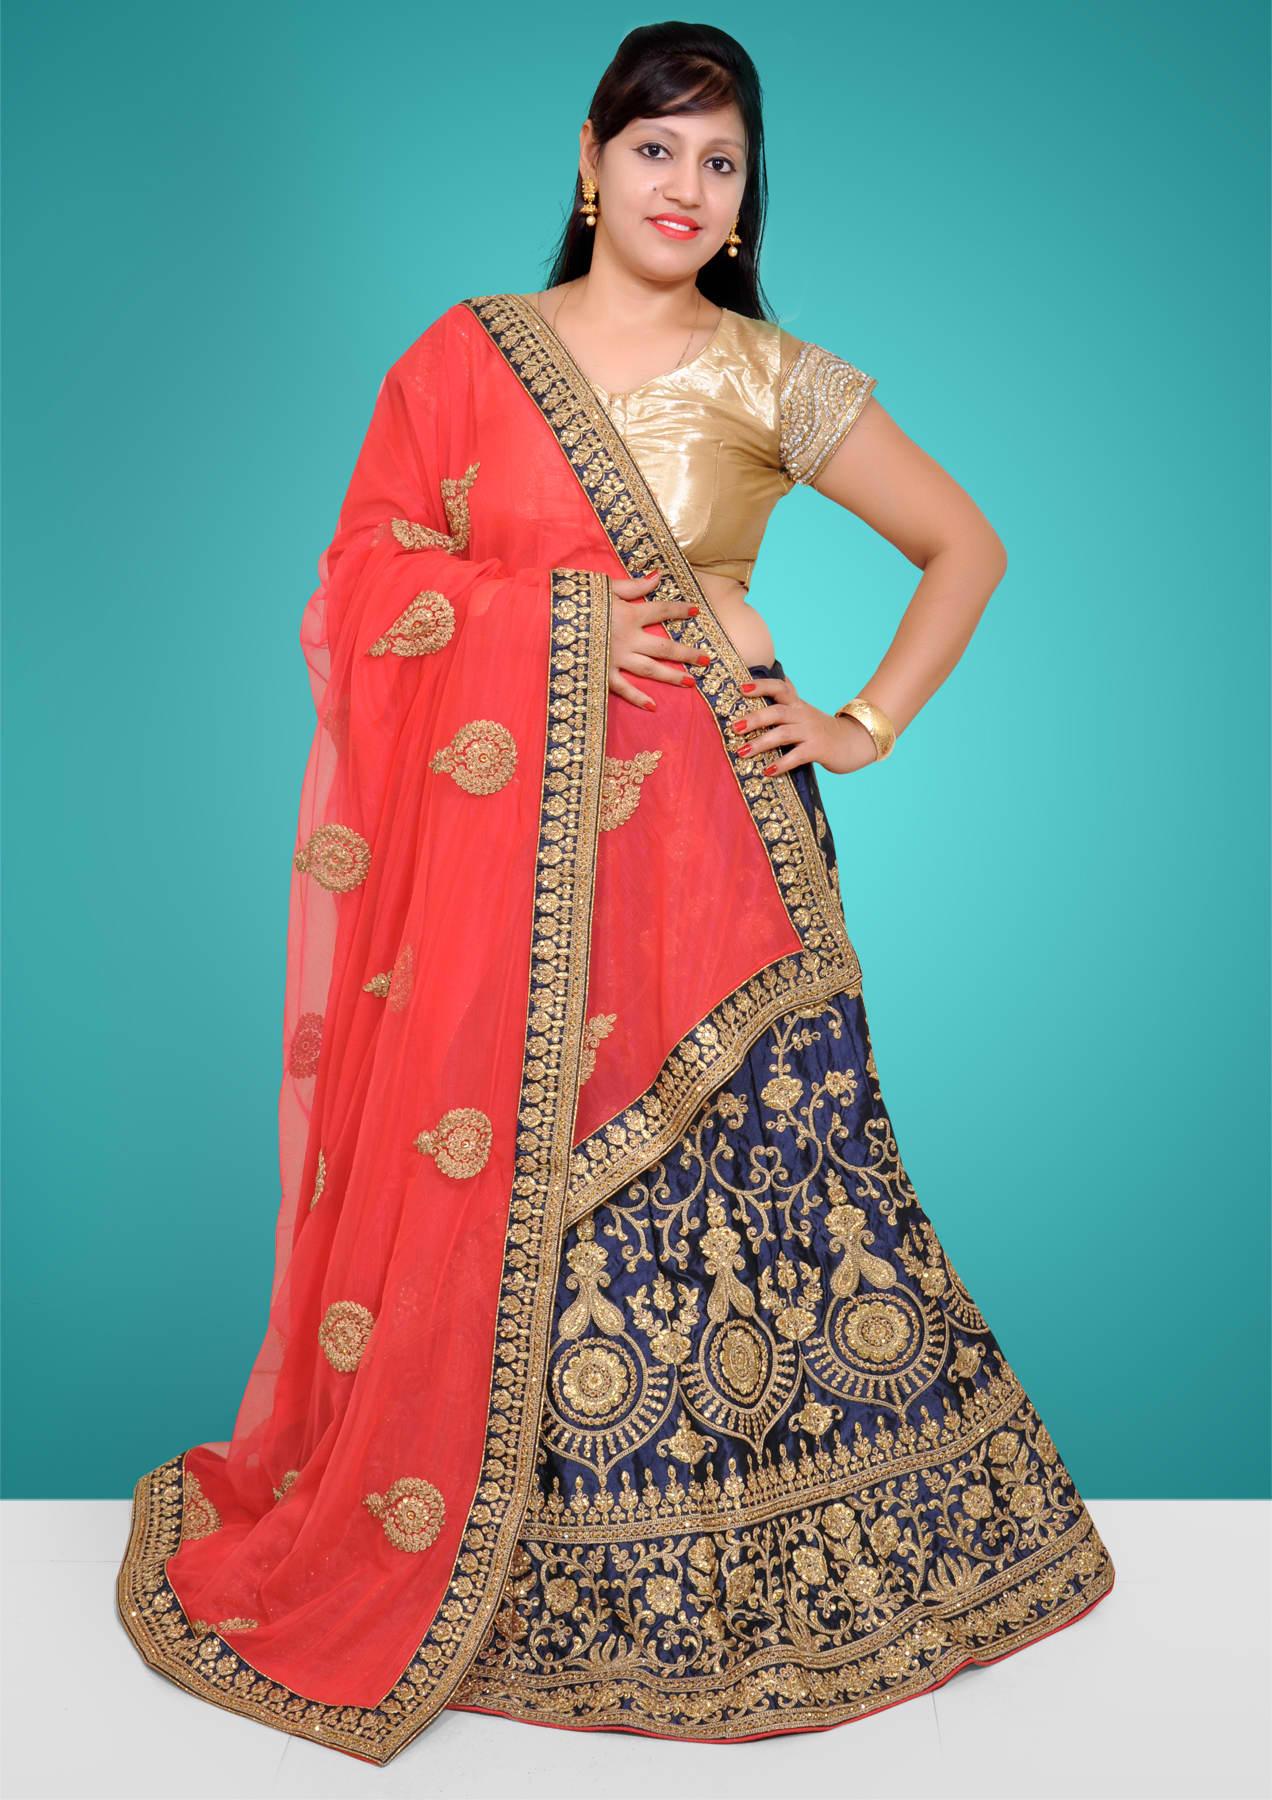 Womens Ethnic Clothing on Rent & Lend: Vastram Fashion Rental India